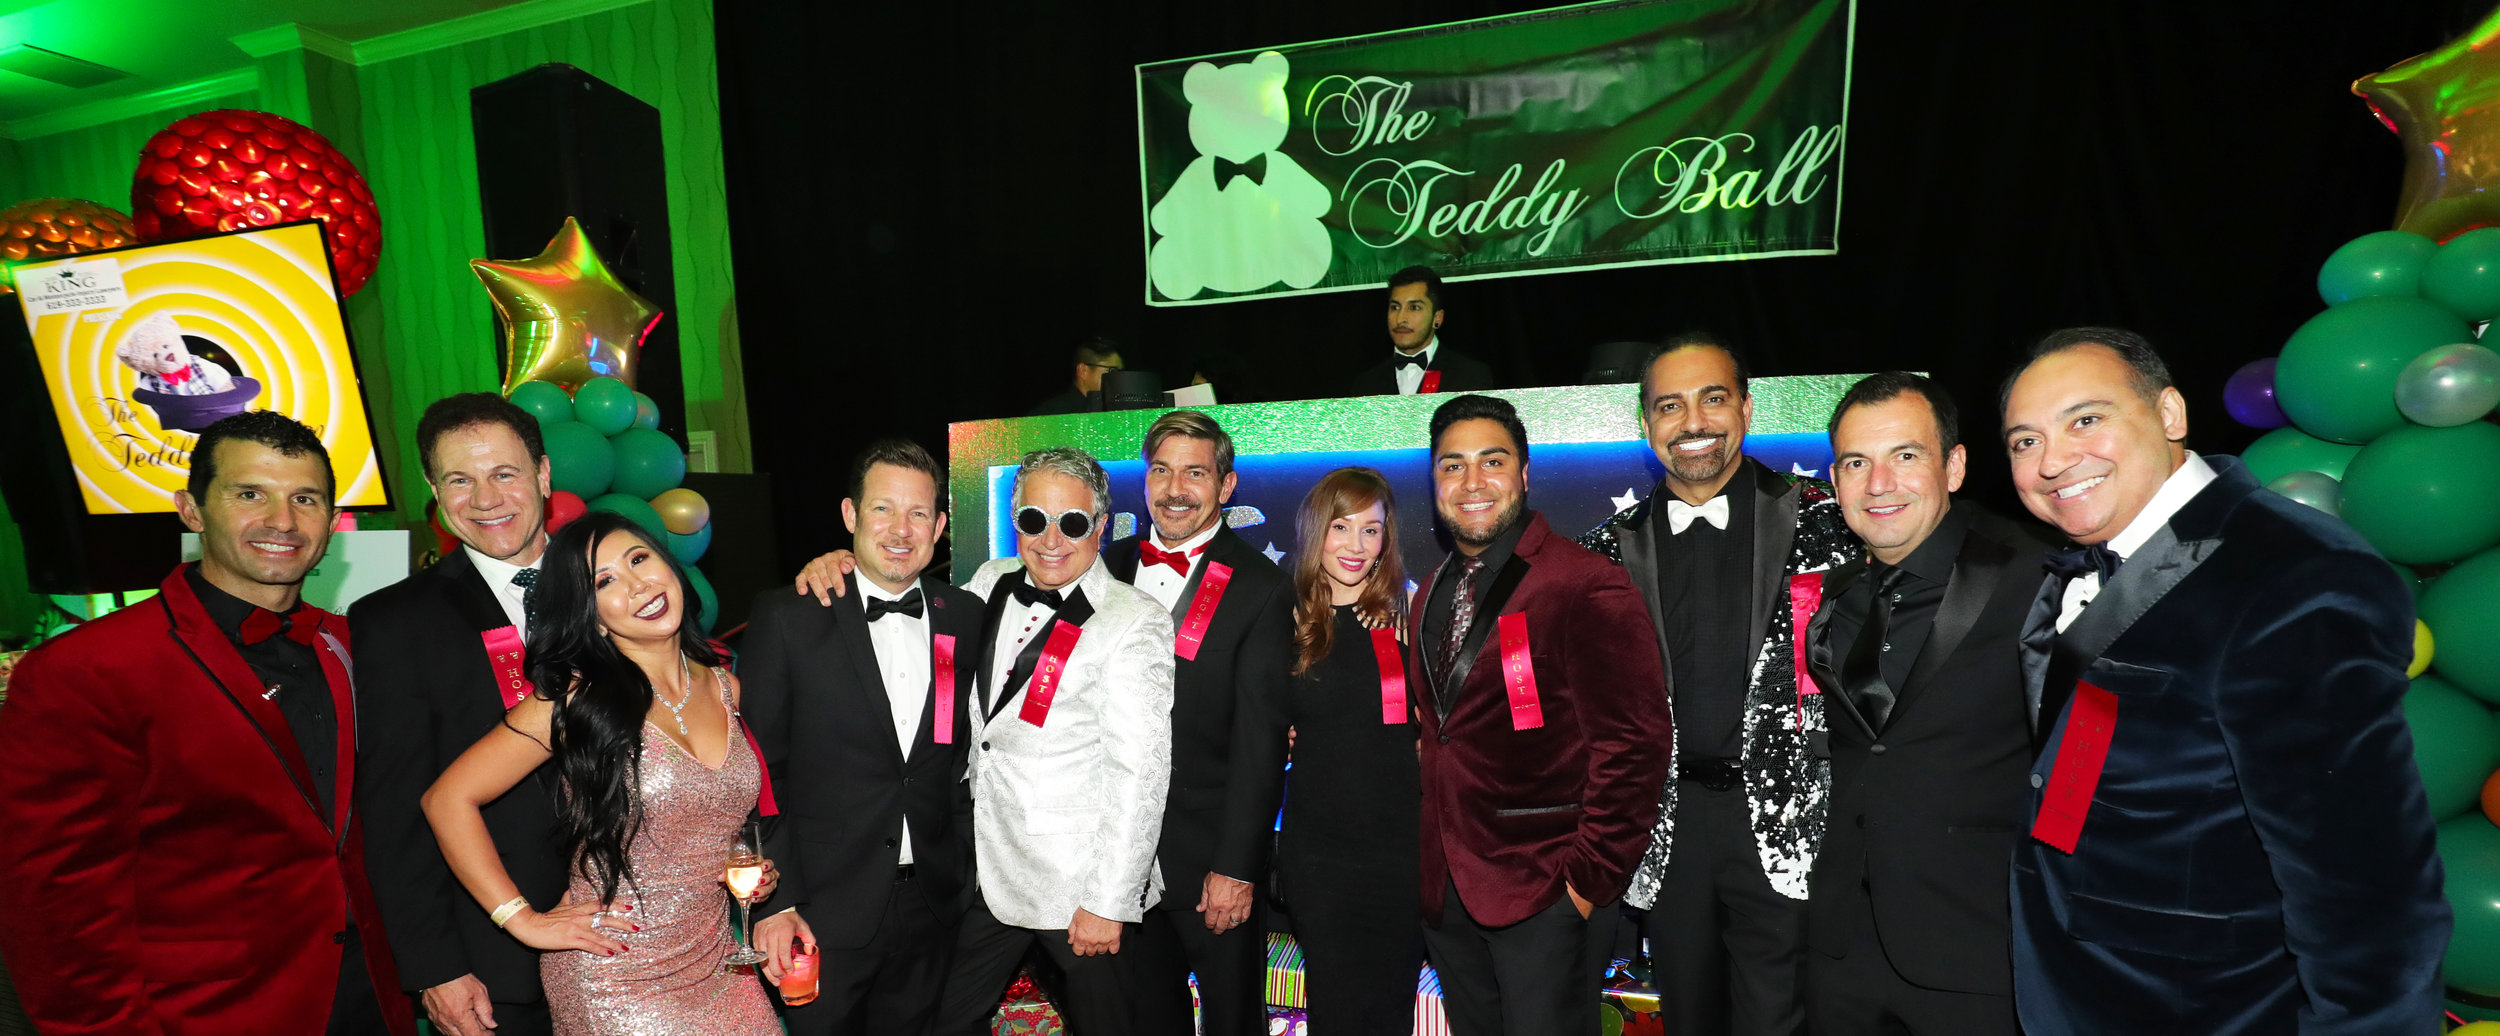 2016 Teddy ball hosts (Nino Venturella, brent wilsey, dylan marer, maurice maio, martin nace hall, kimberly ceballos, johnny castillo, king aminpour, rich ahumada, and prem advani)